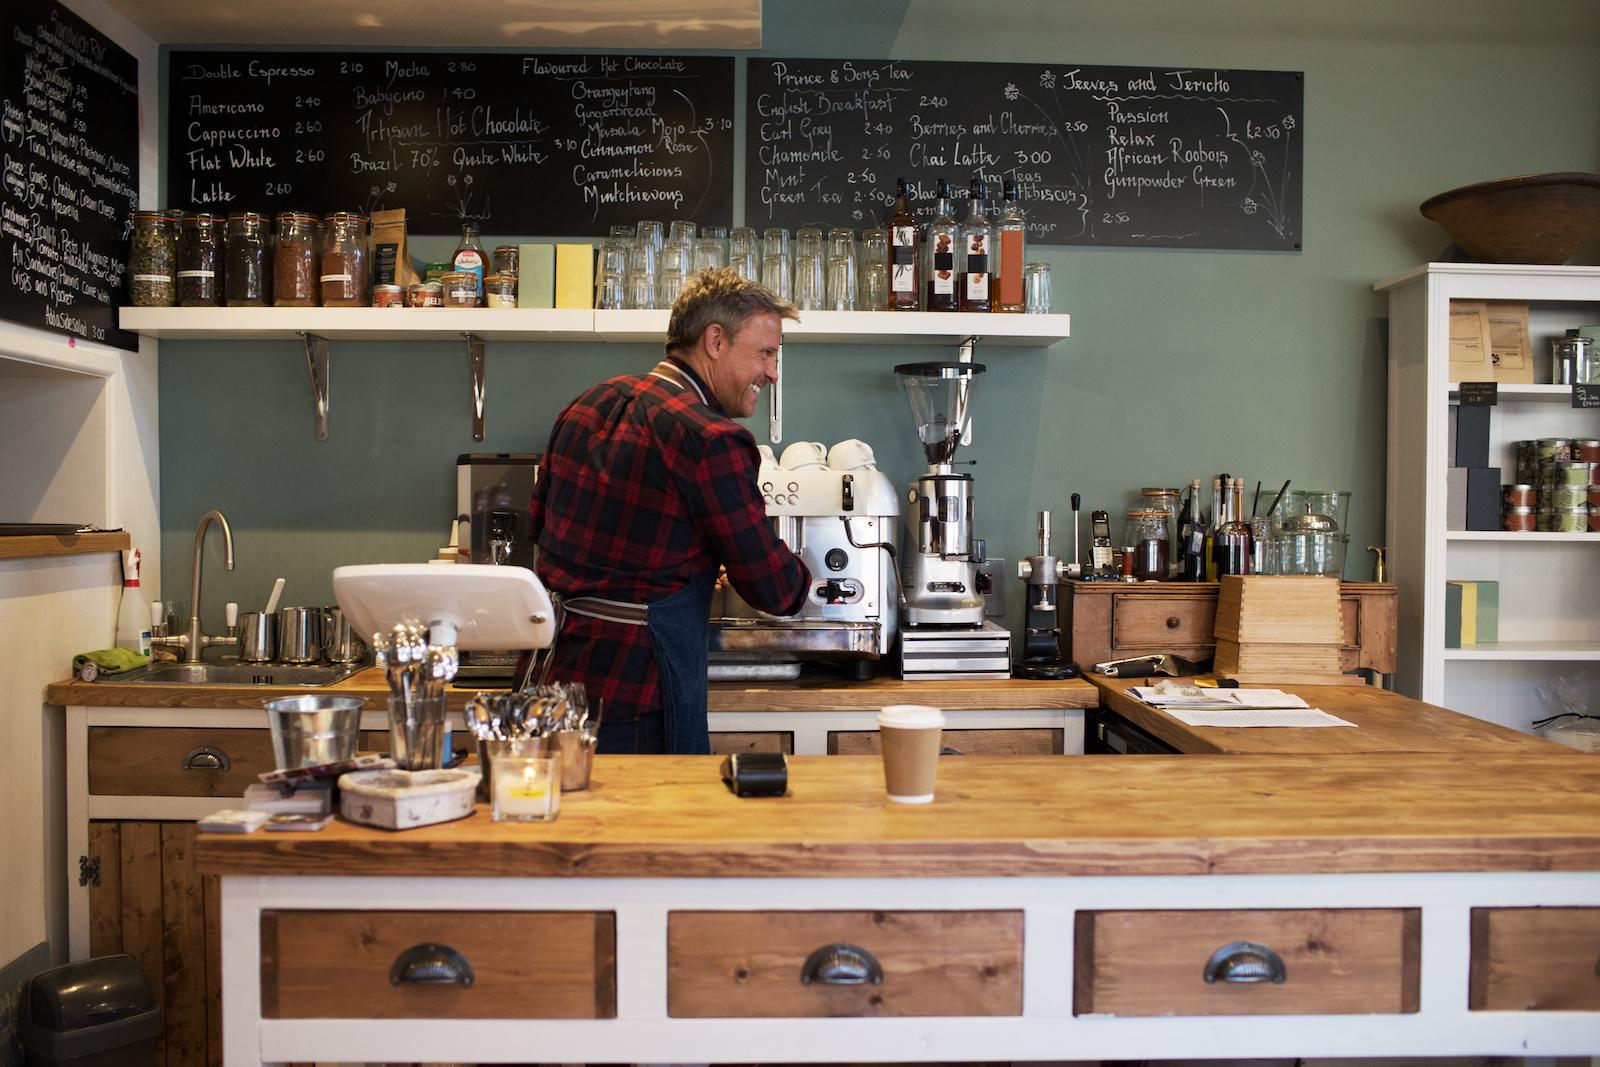 Male Barista Preparing Hot Drink In Coffee Shop